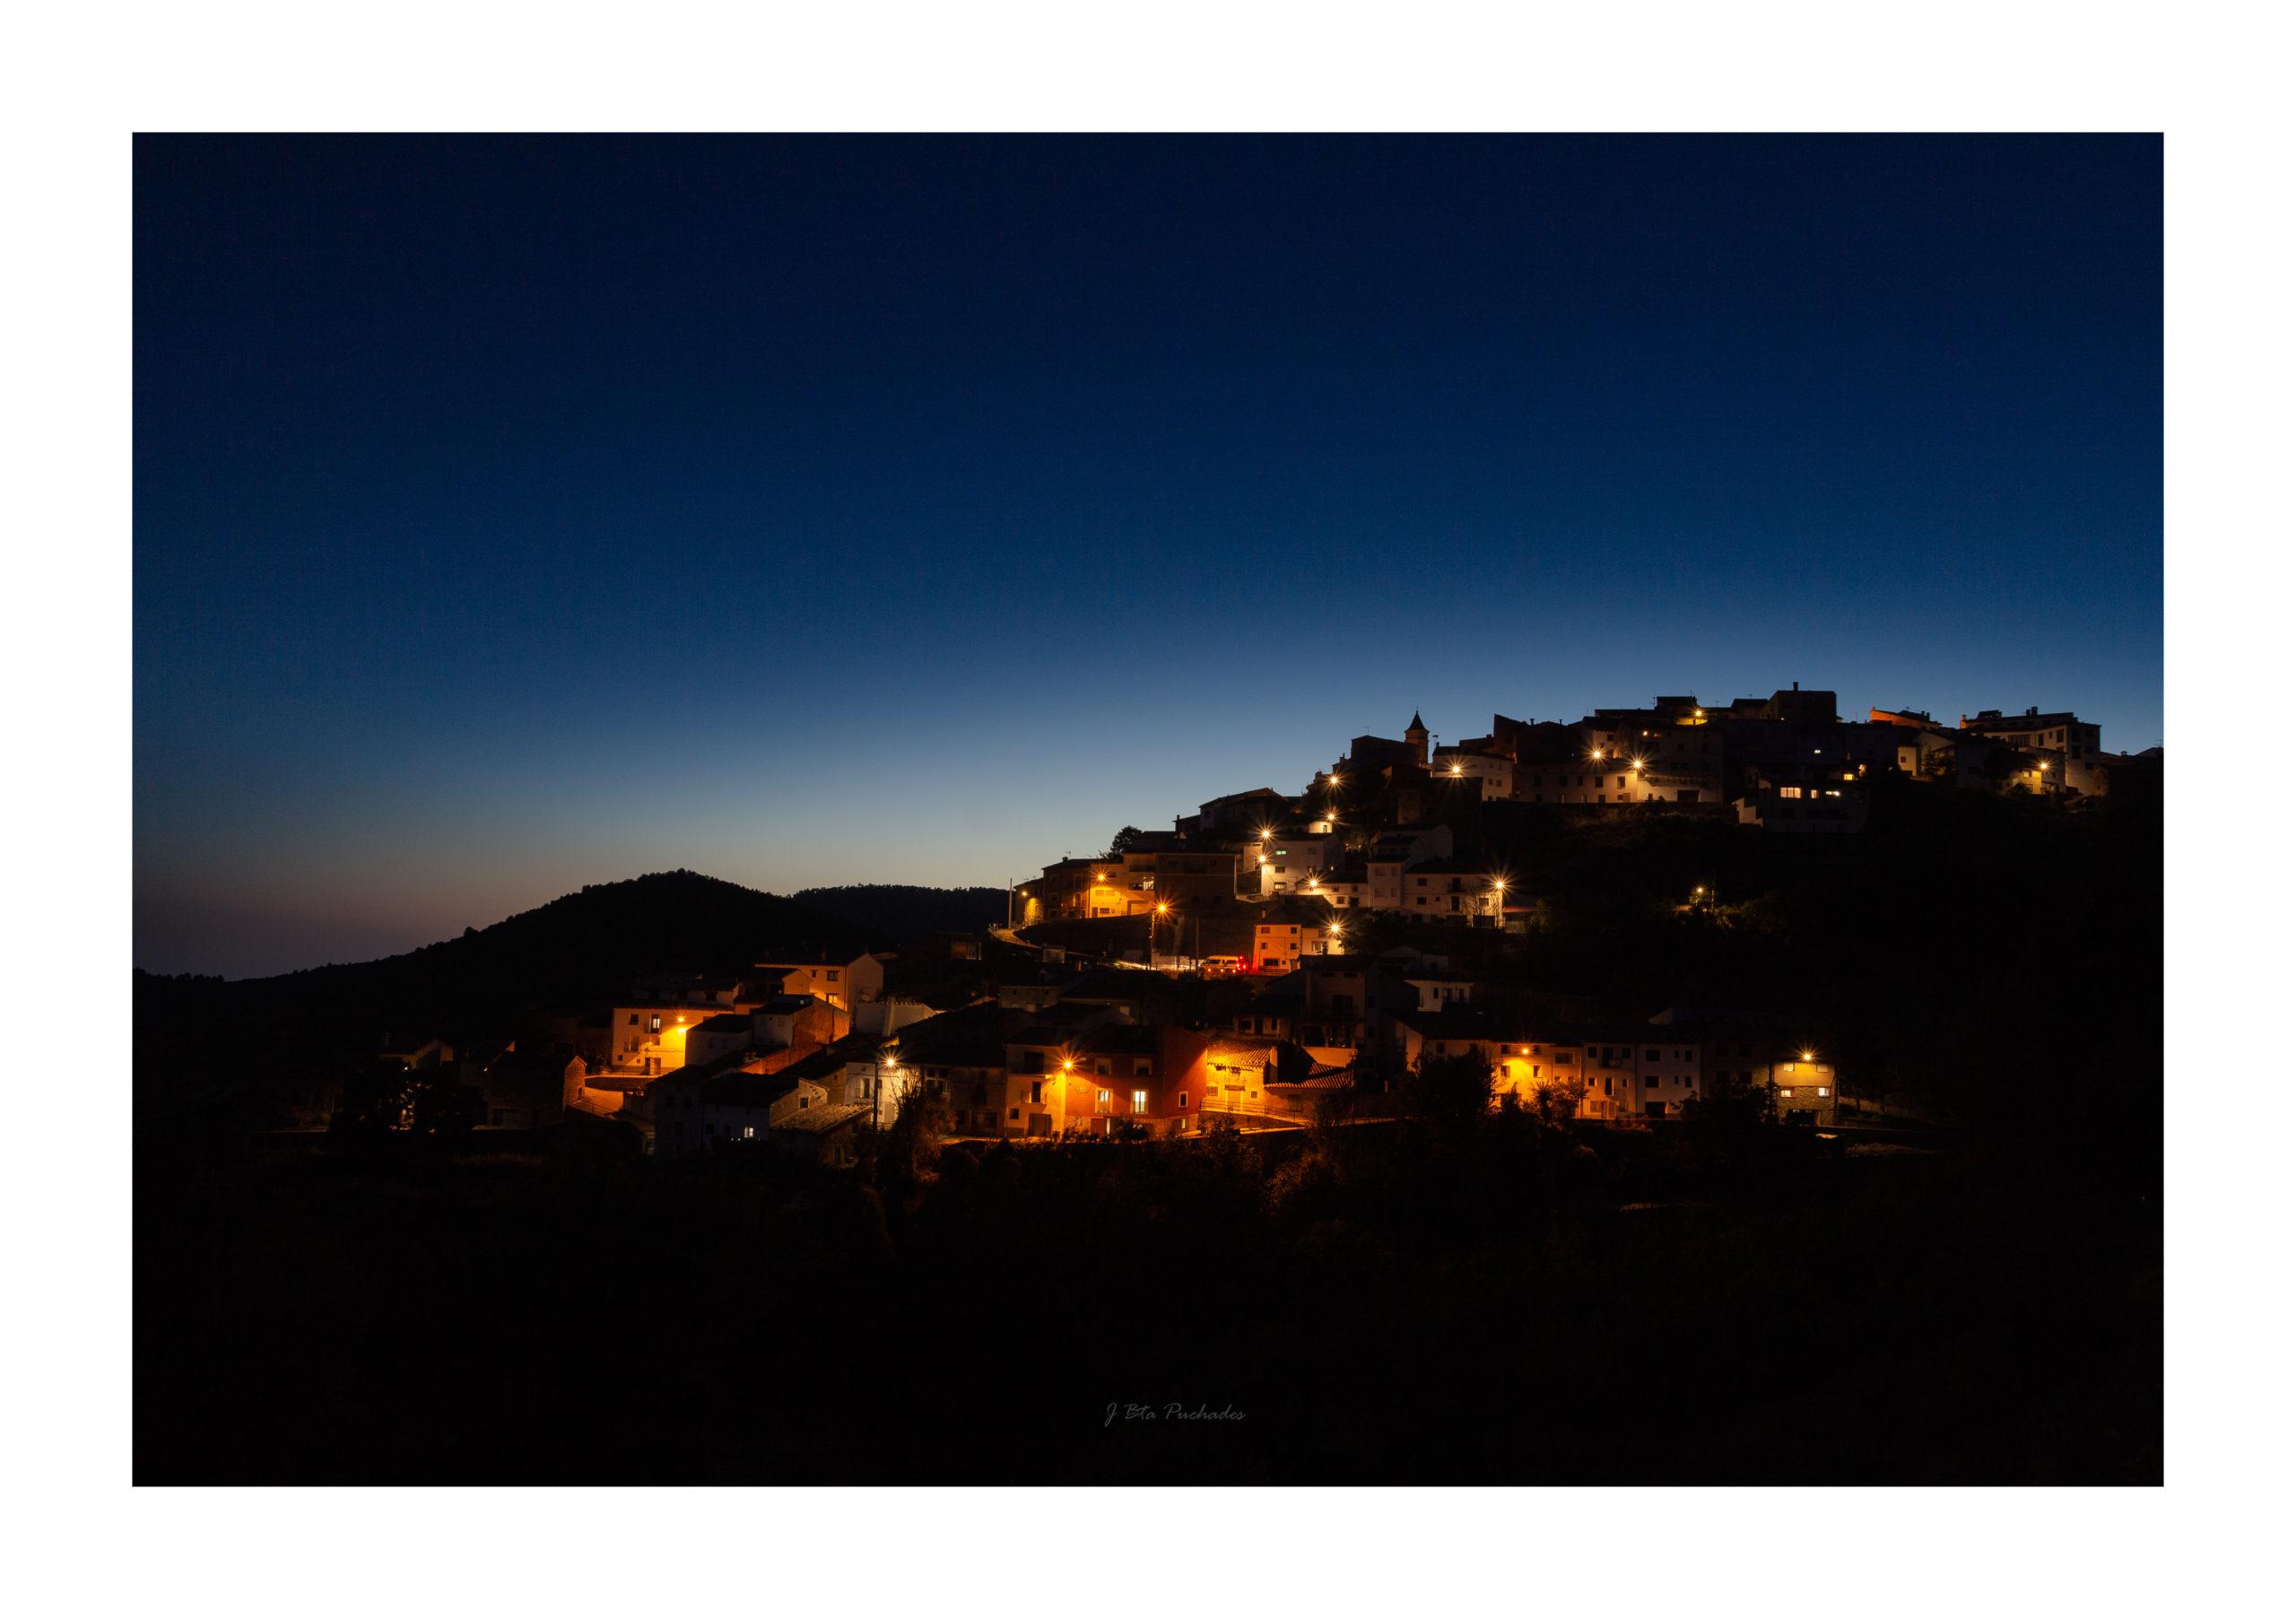 Time Blending al poble de Torrijas deixant que la nit m´envolte.te